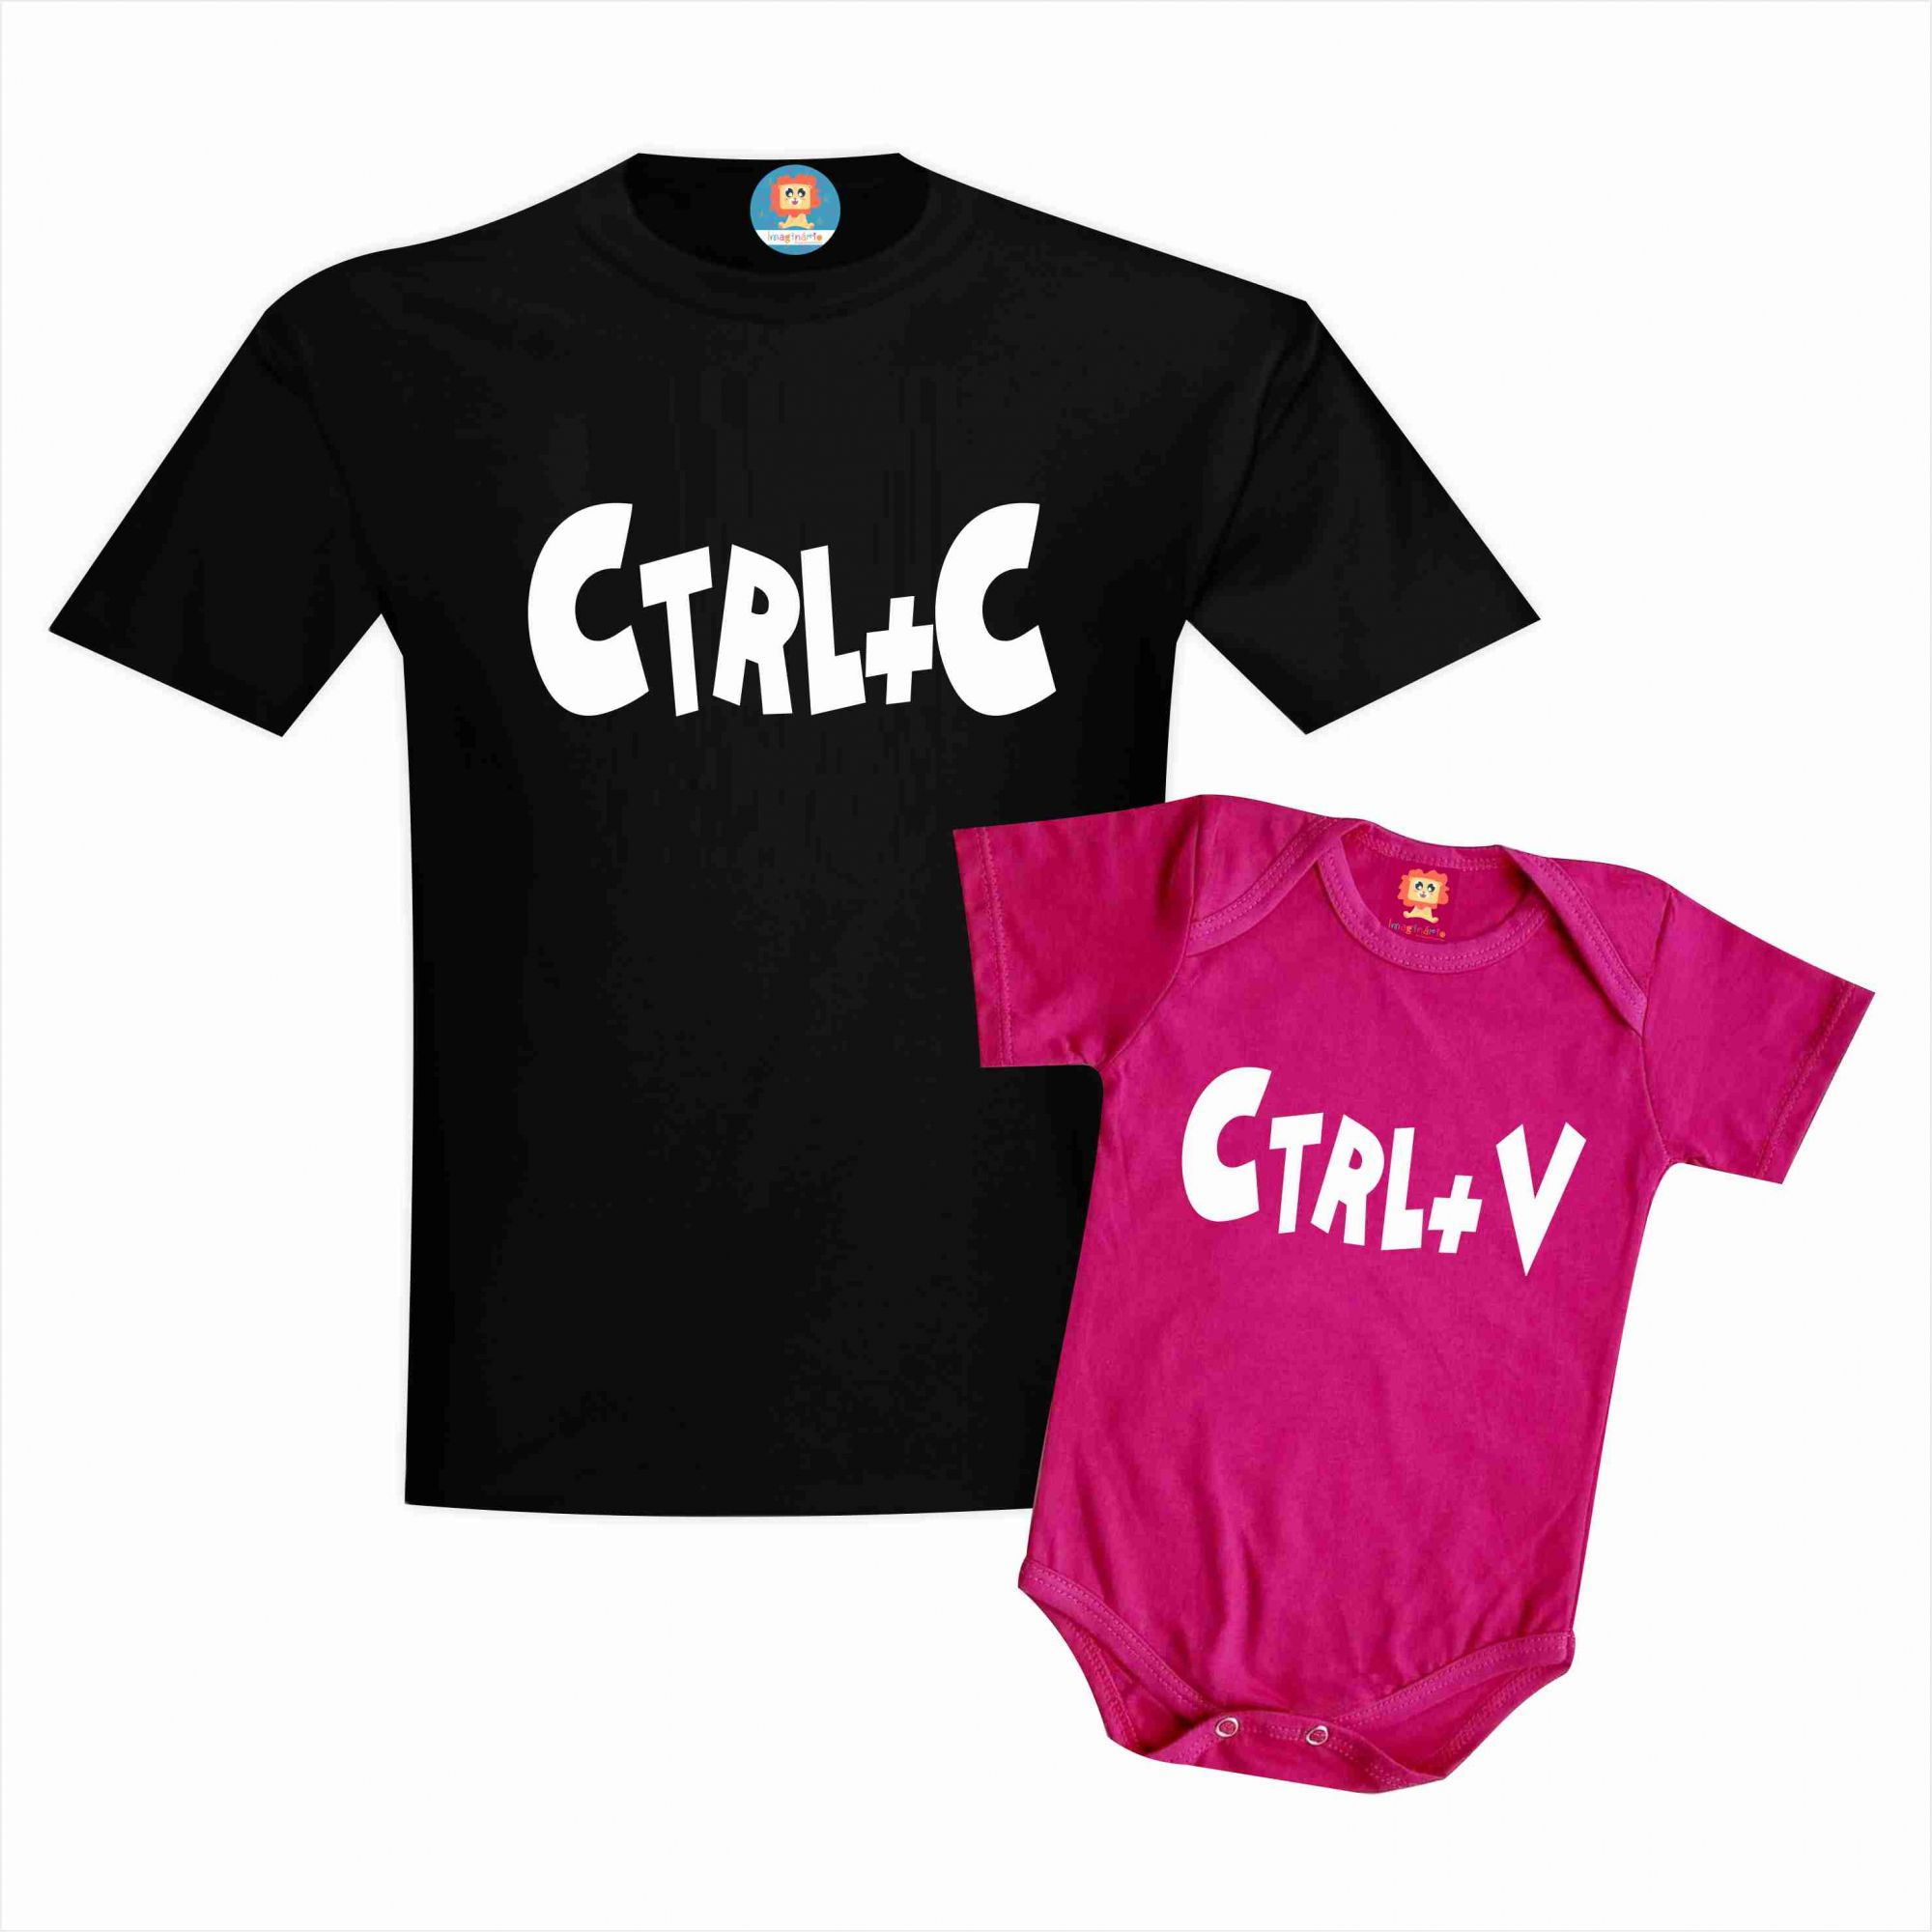 Kit Camisetas Dia dos Pais CTRL+C e CTRL+V